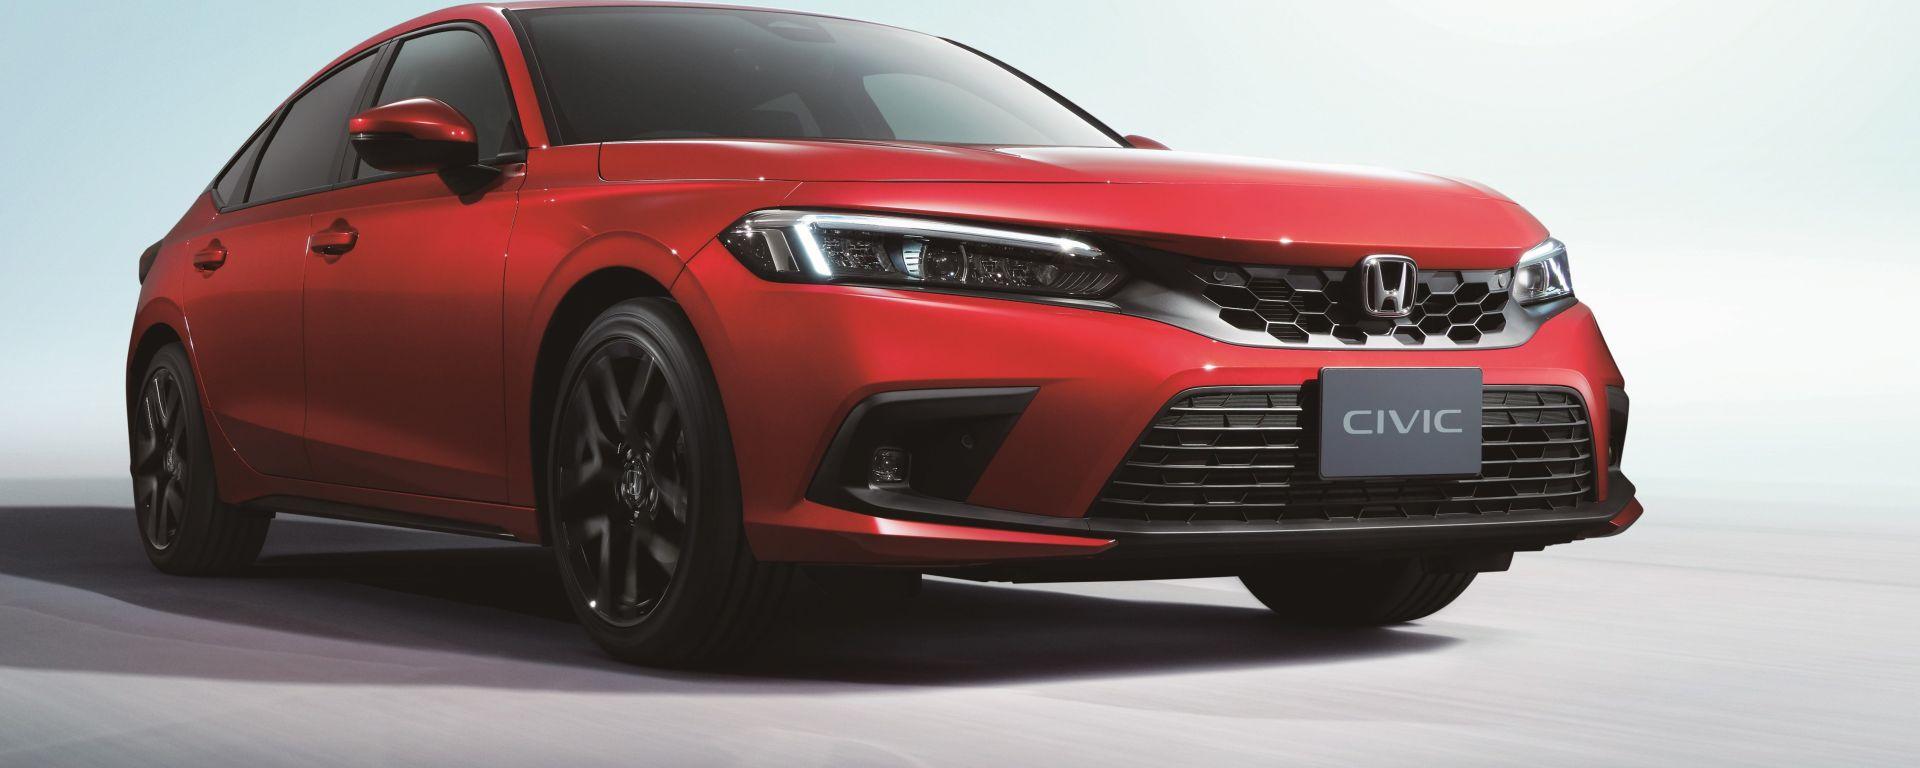 Nuova Honda Civic 5 porte: appuntamento al 2022